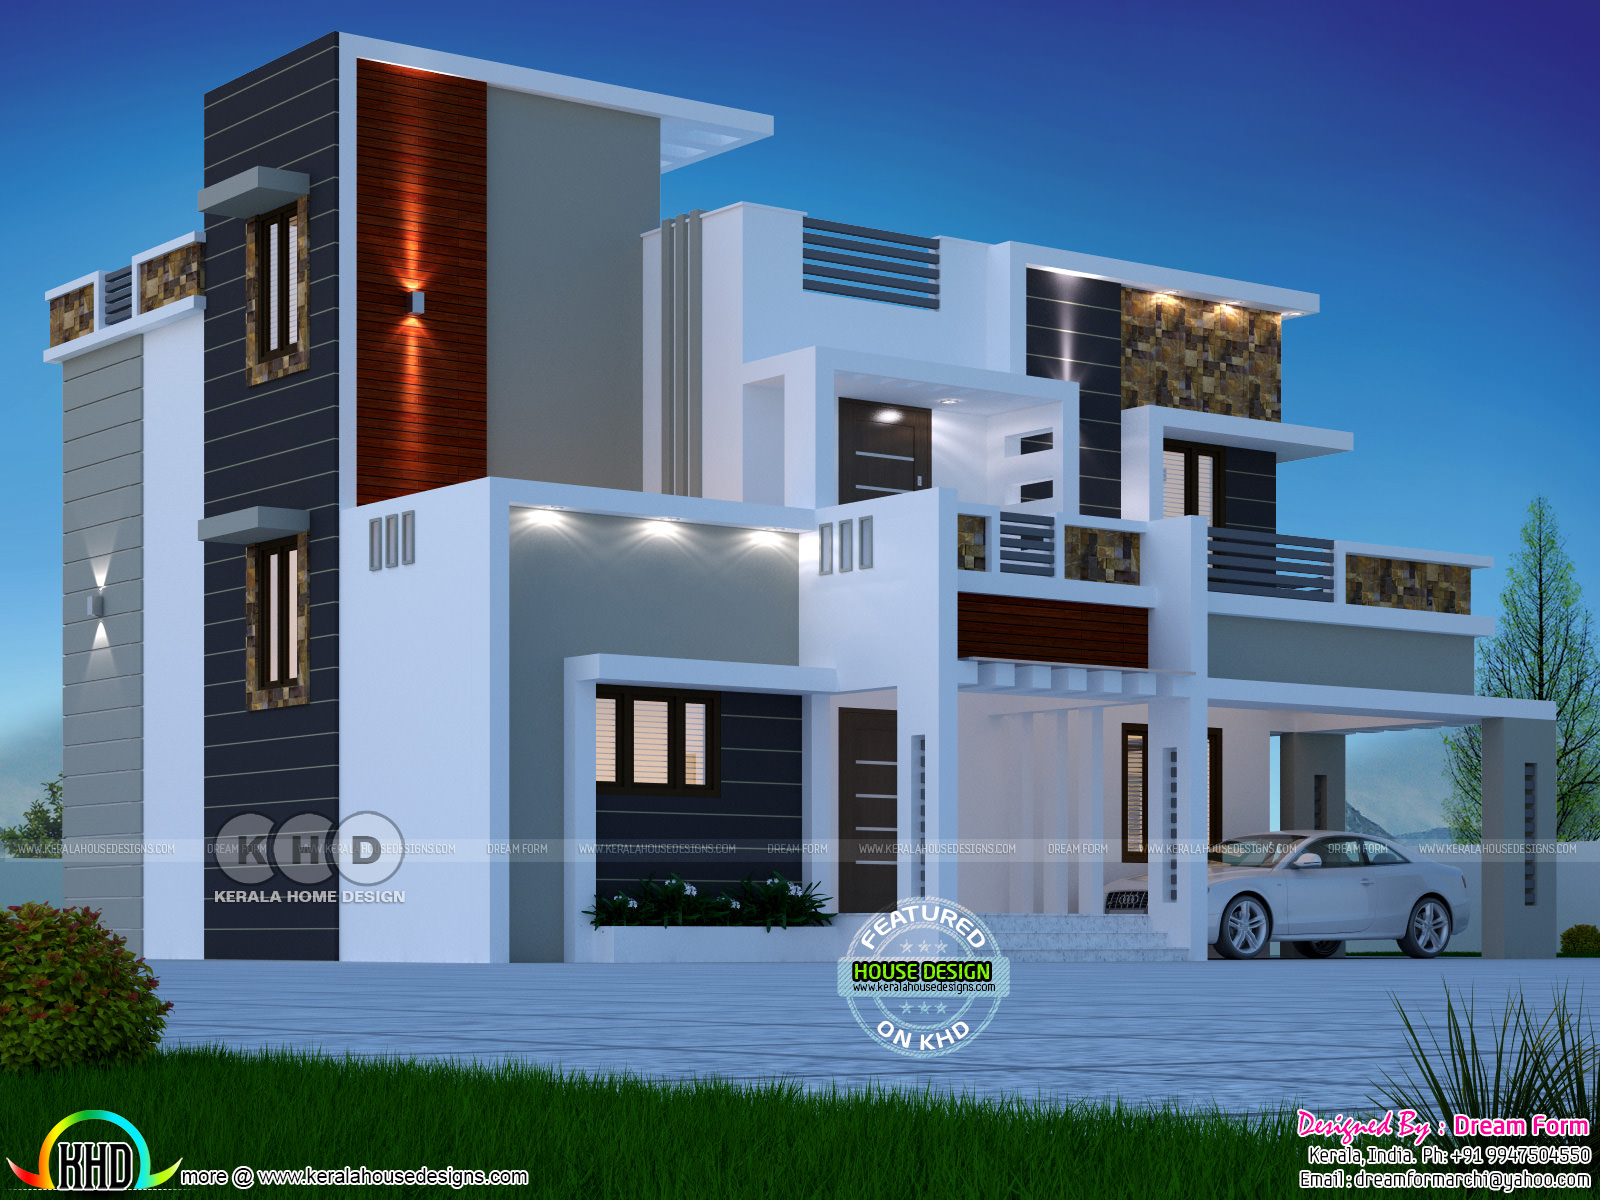 4 Bedroom 2074 Sqft Modern Home Design Kerala Home Design